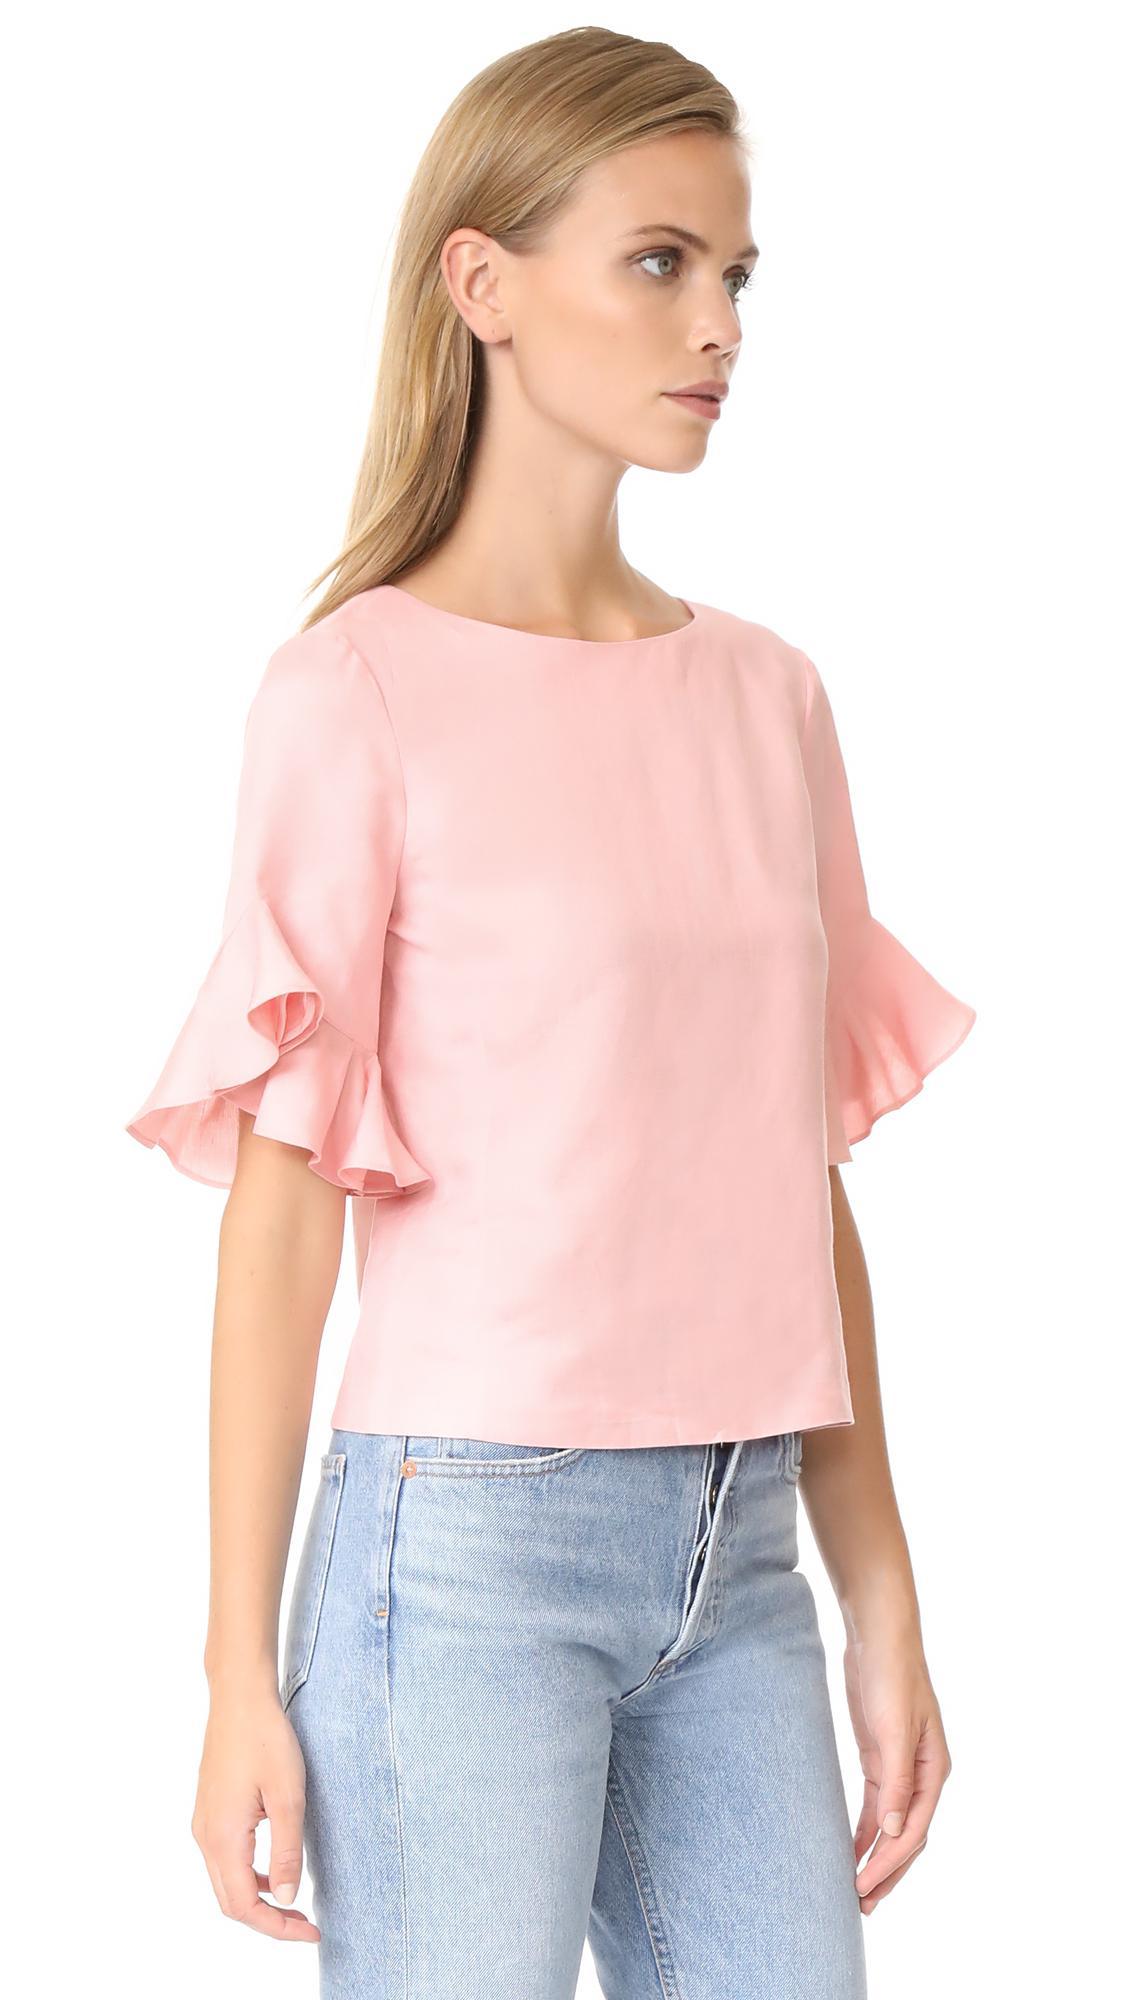 2e1780d043bd1 Club Monaco Hatleth Top in Pink - Lyst